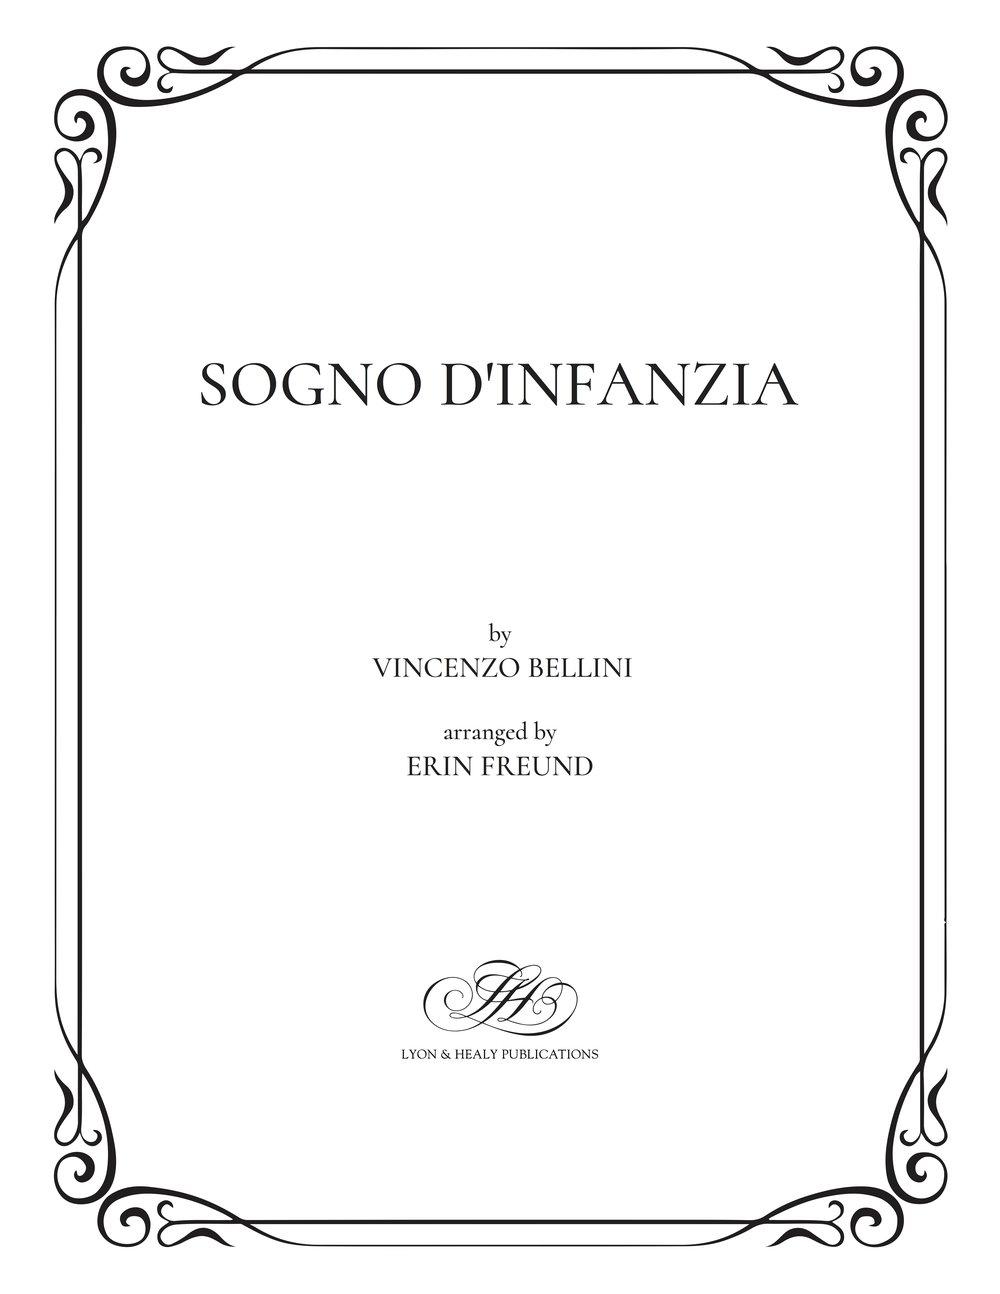 Sogno d'infanzia - Bellini-Freund cover.jpg